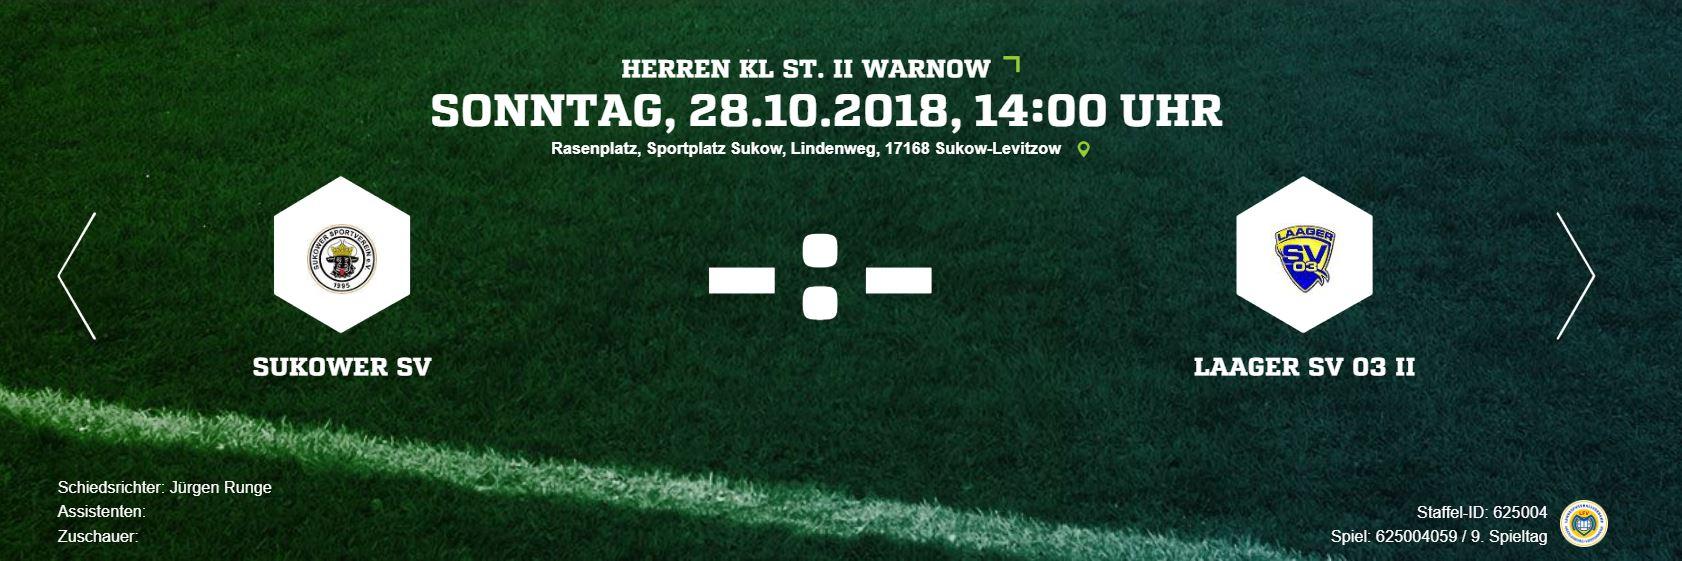 20181028 1400 Fußball II